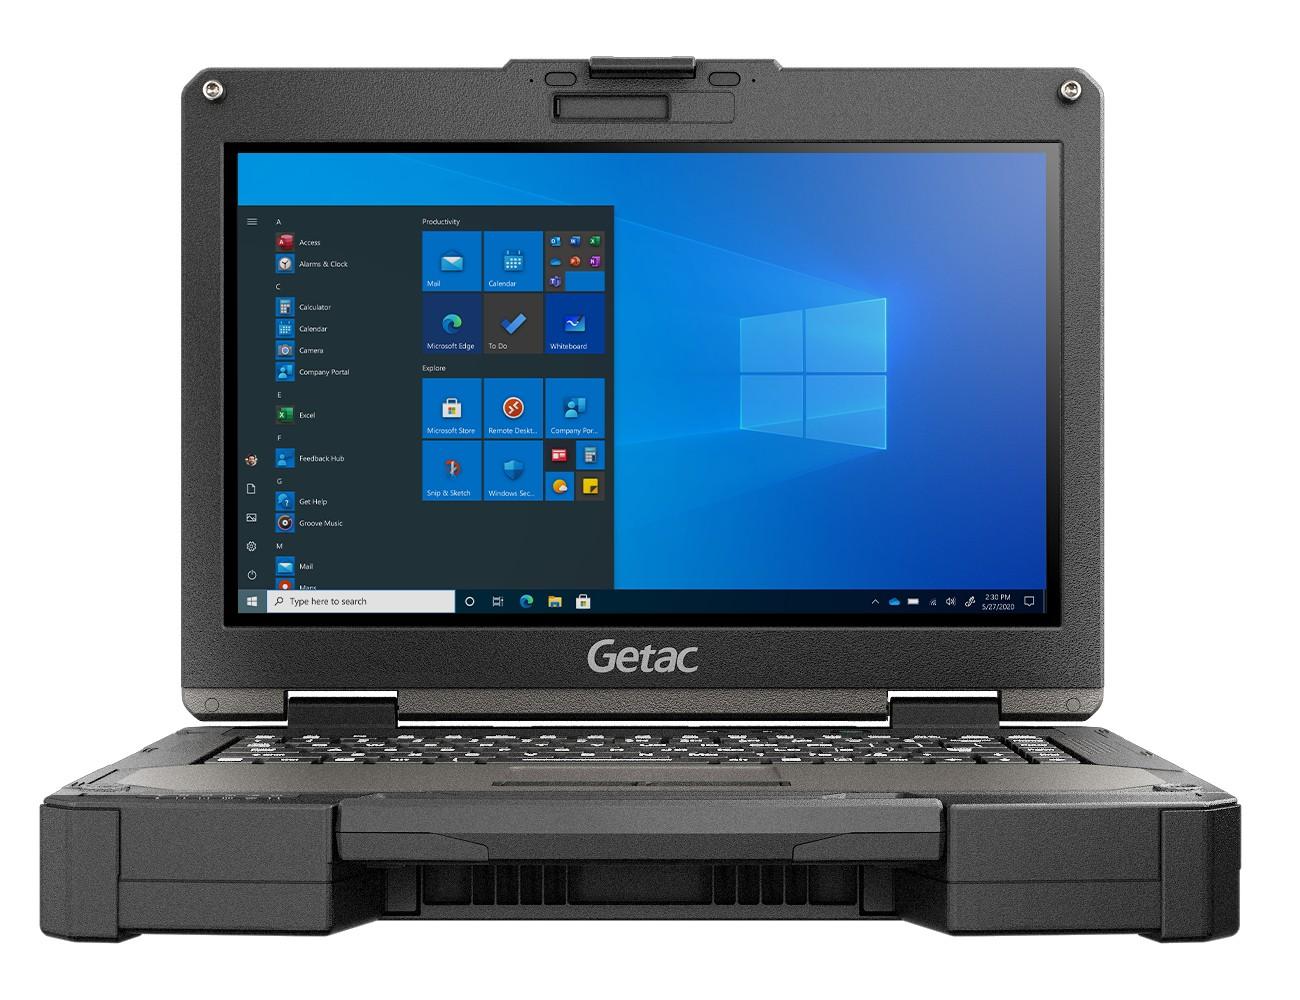 "Getac B360 PRO DDR4-SDRAM Notebook 33,8 cm (13.3"") 1920 x 1080 Pixels Touchscreen Intel® 10de generatie Core™ i5 16 GB 256 GB SSD NVIDIA® GeForce® GTX 1050 Wi-Fi 6 (802.11ax) Windows 10 Pro Zwart"